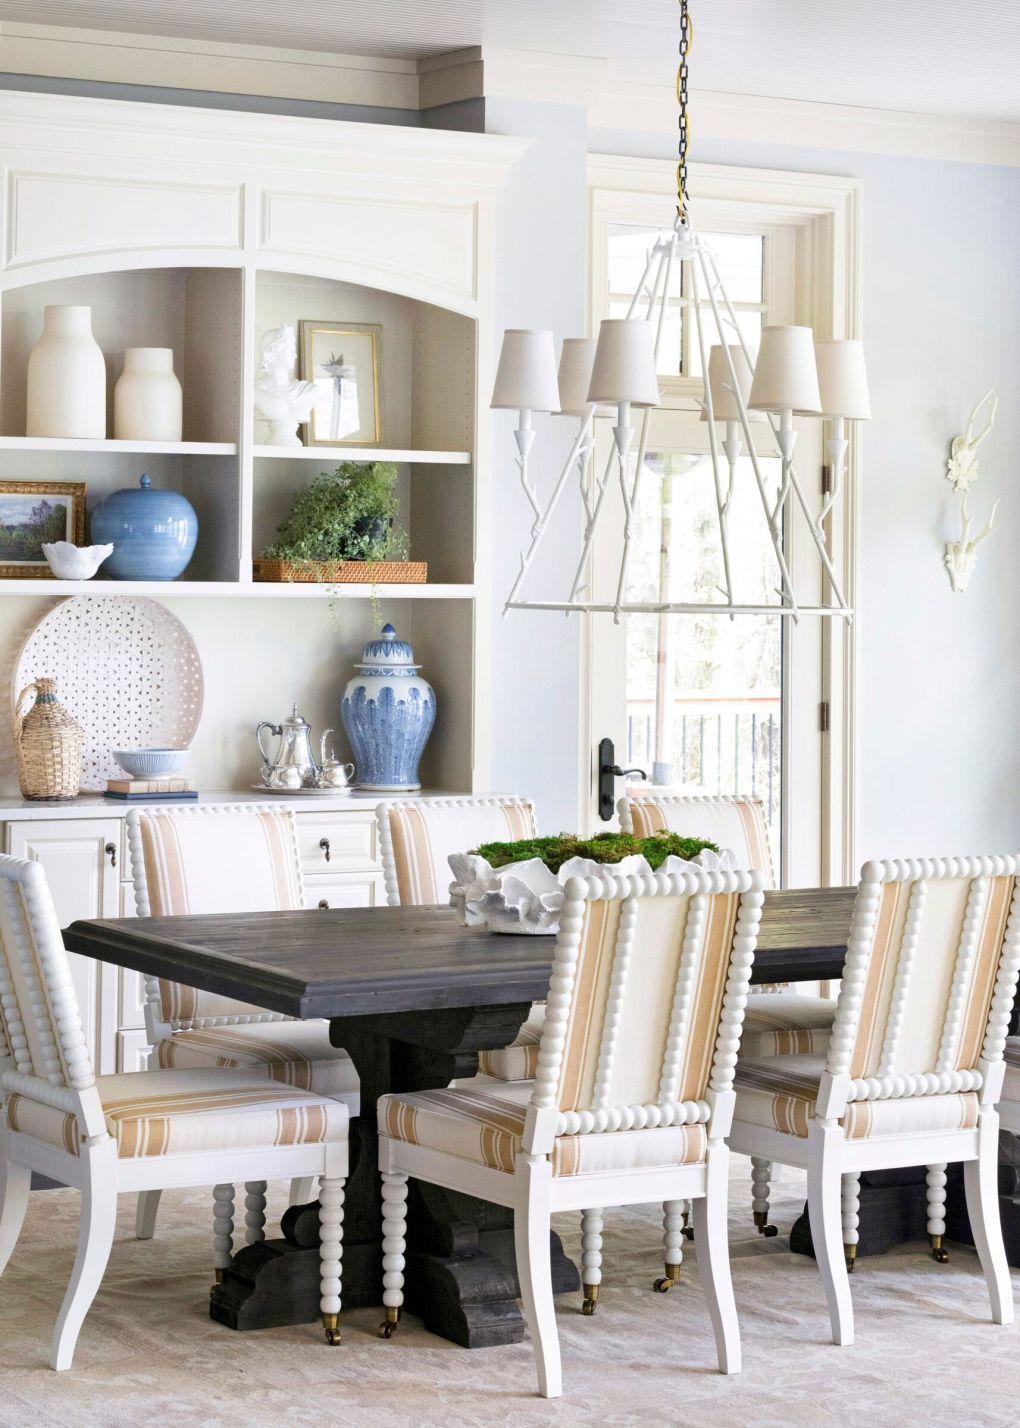 home decor trends 2020 - vintage spooled legs